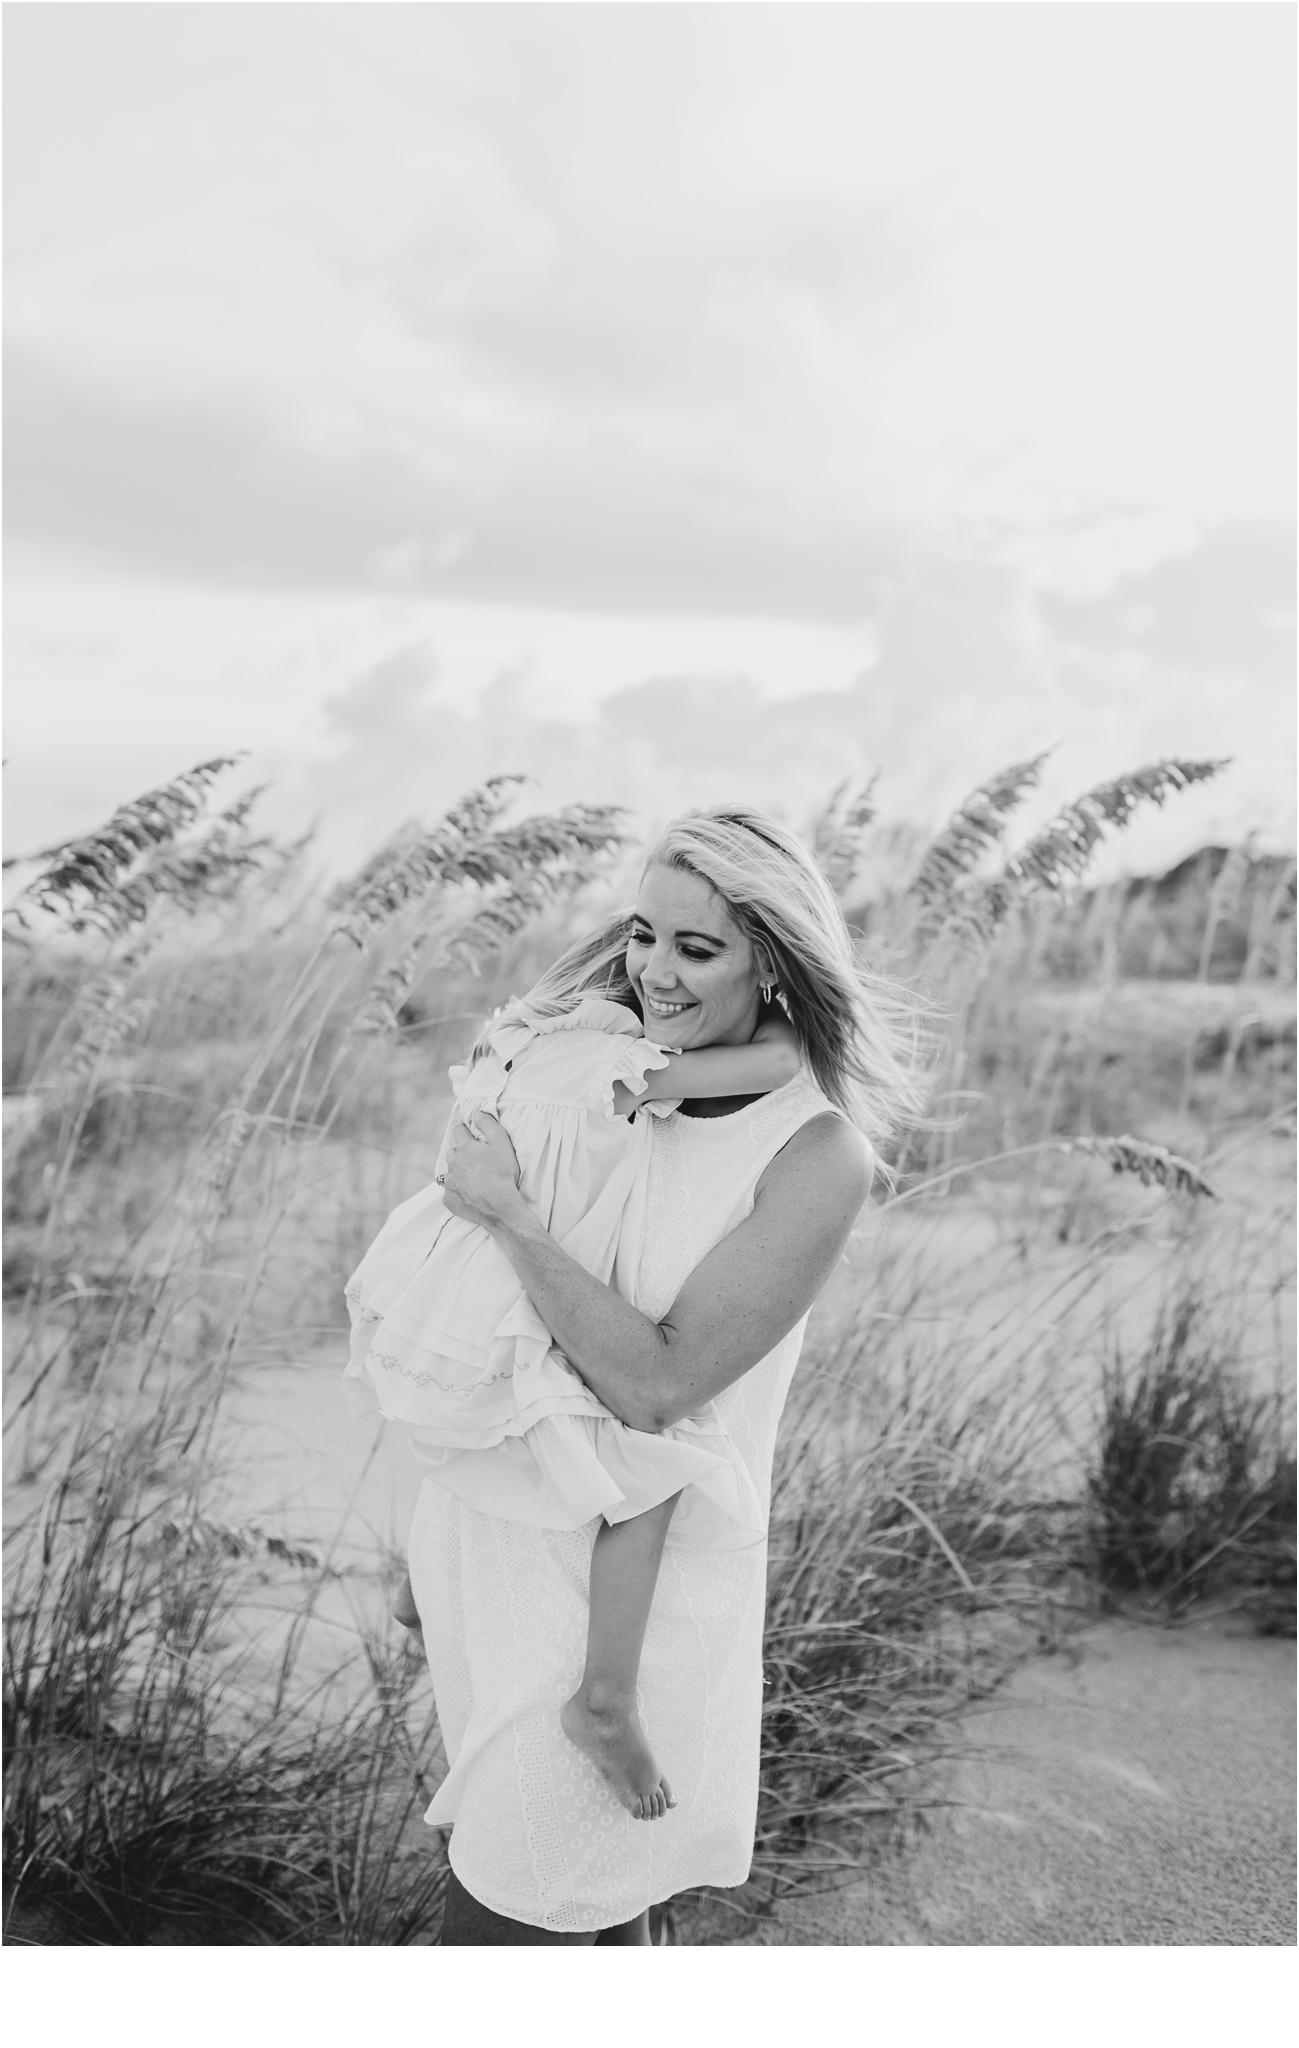 Rainey_Gregg_Photography_St._Simons_Island_Georgia_California_Wedding_Portrait_Photography_1183.jpg